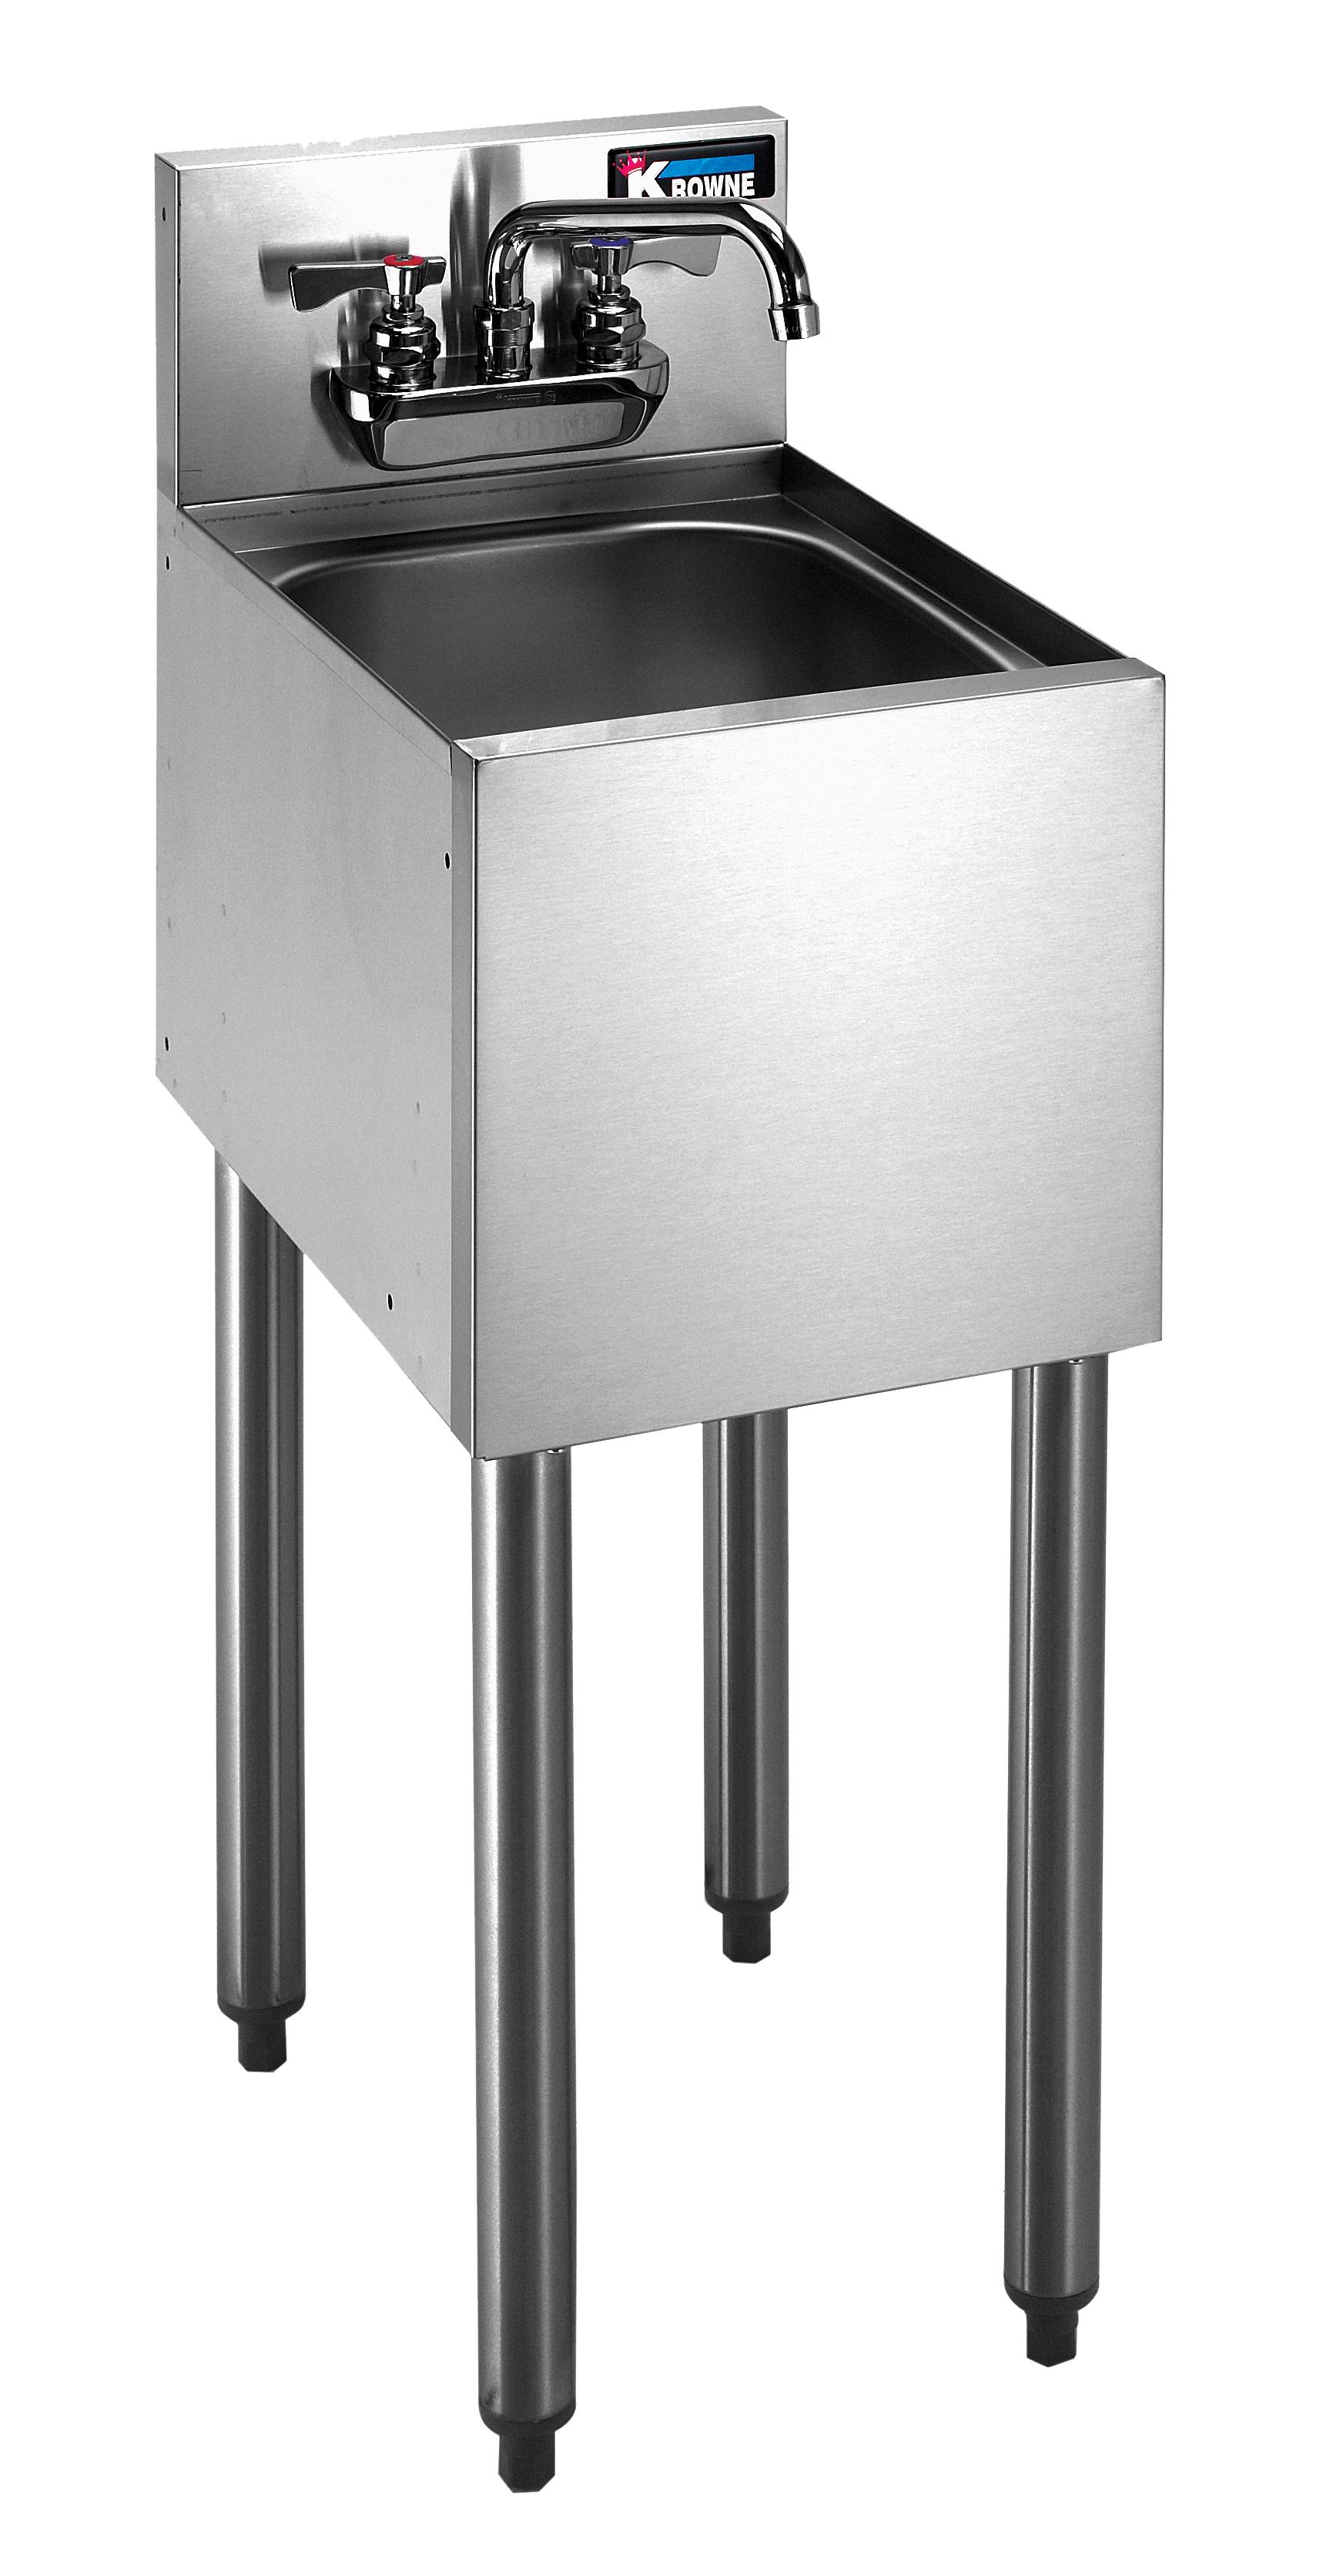 Krowne Metal 21-1C underbar hand sink unit